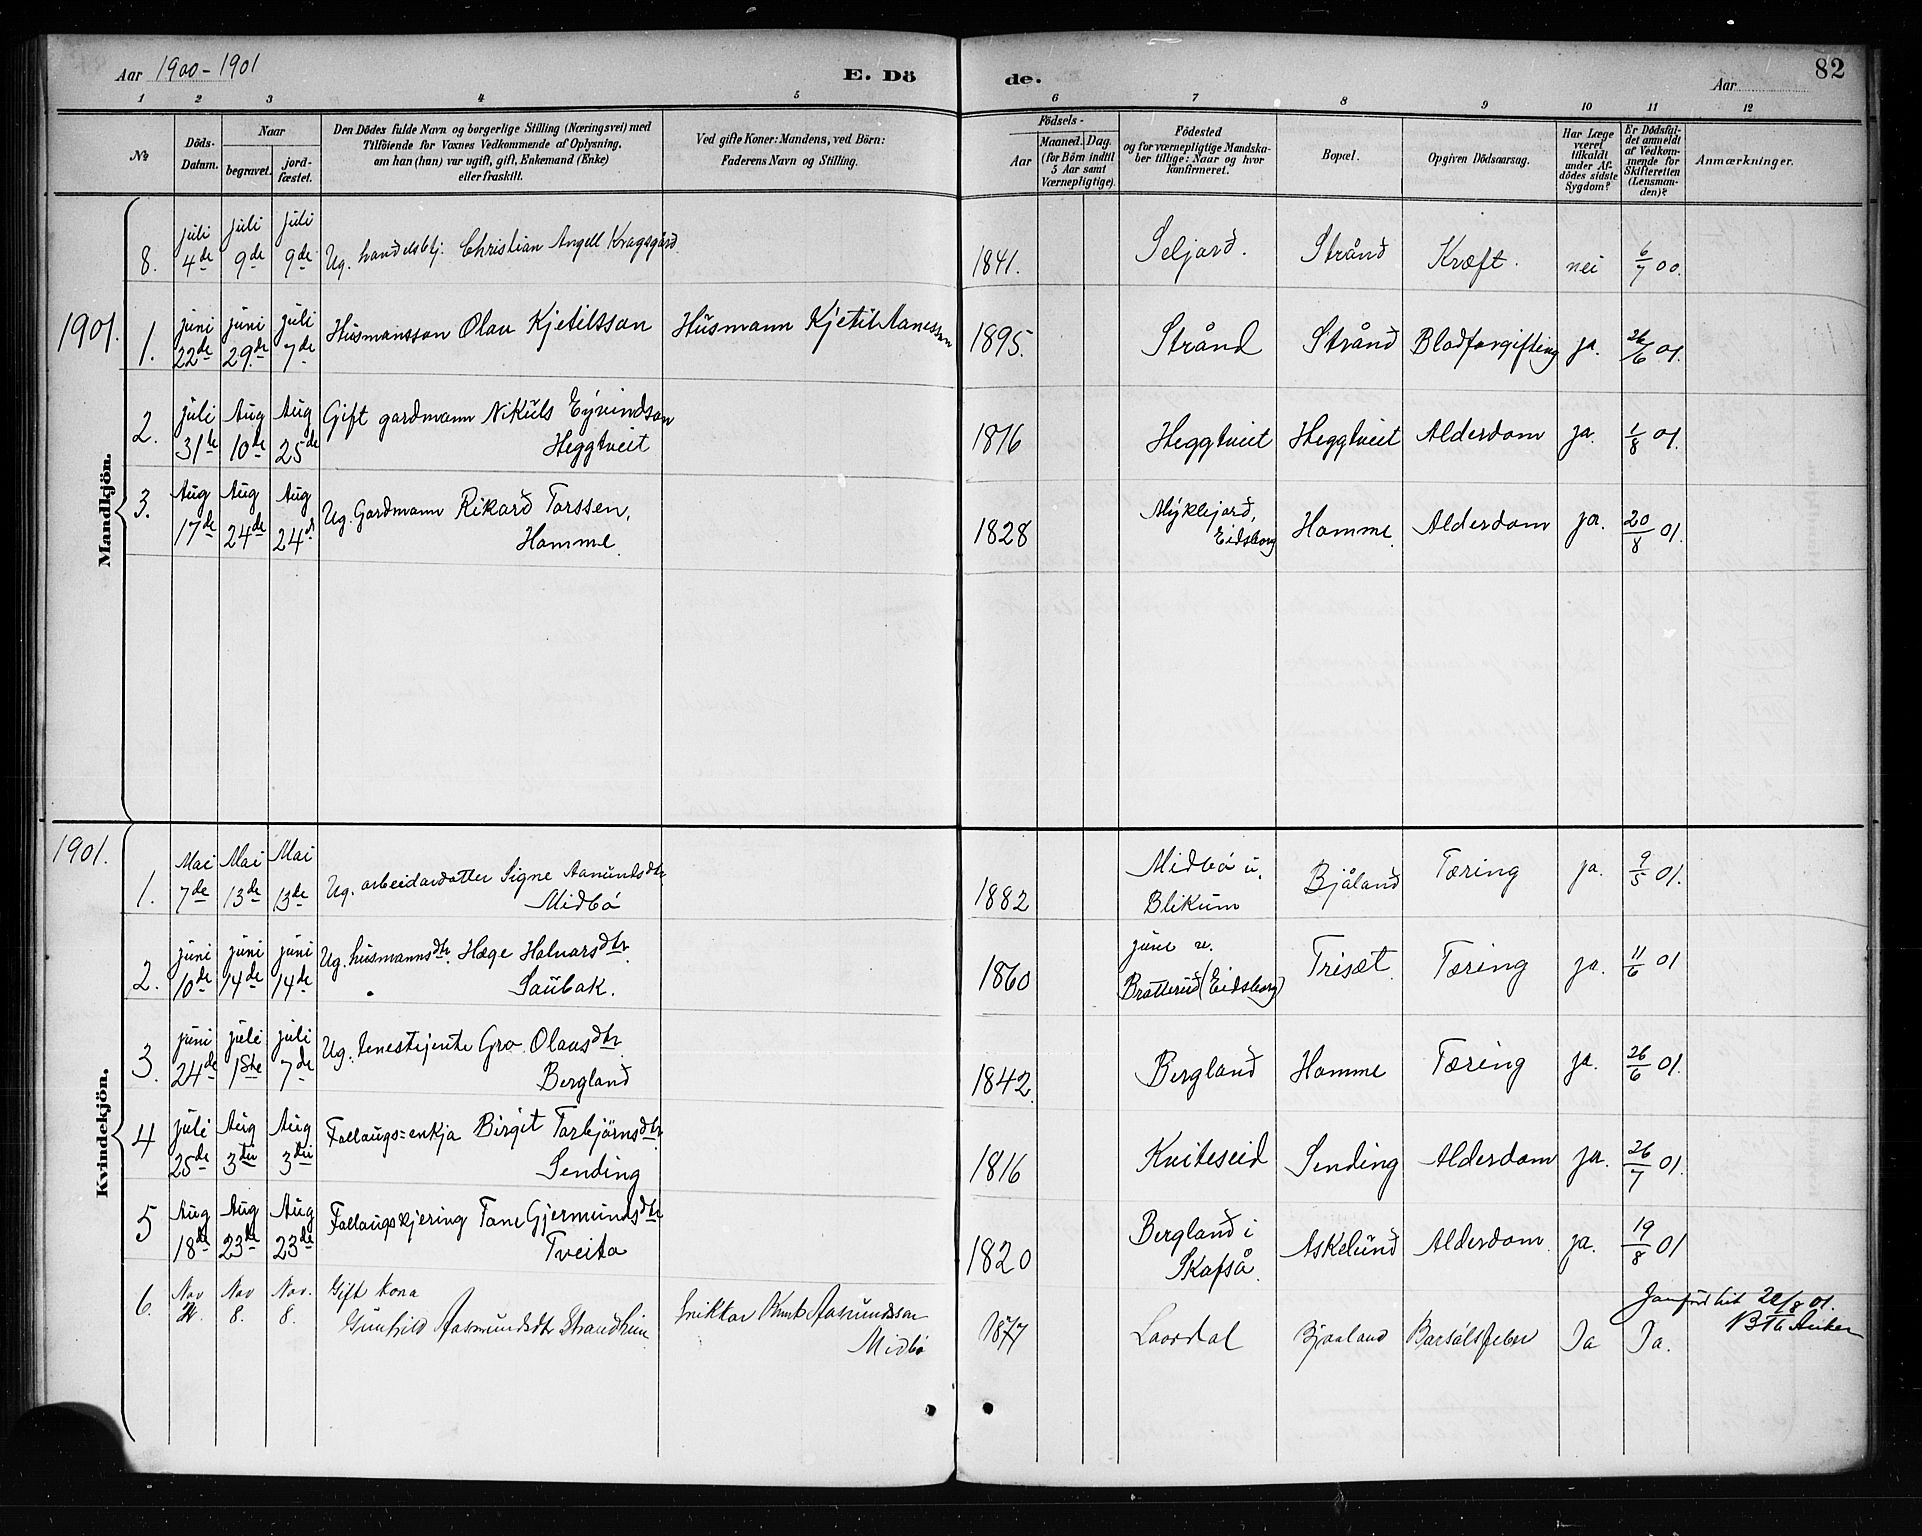 SAKO, Lårdal kirkebøker, G/Ga/L0003: Klokkerbok nr. I 3, 1891-1918, s. 82